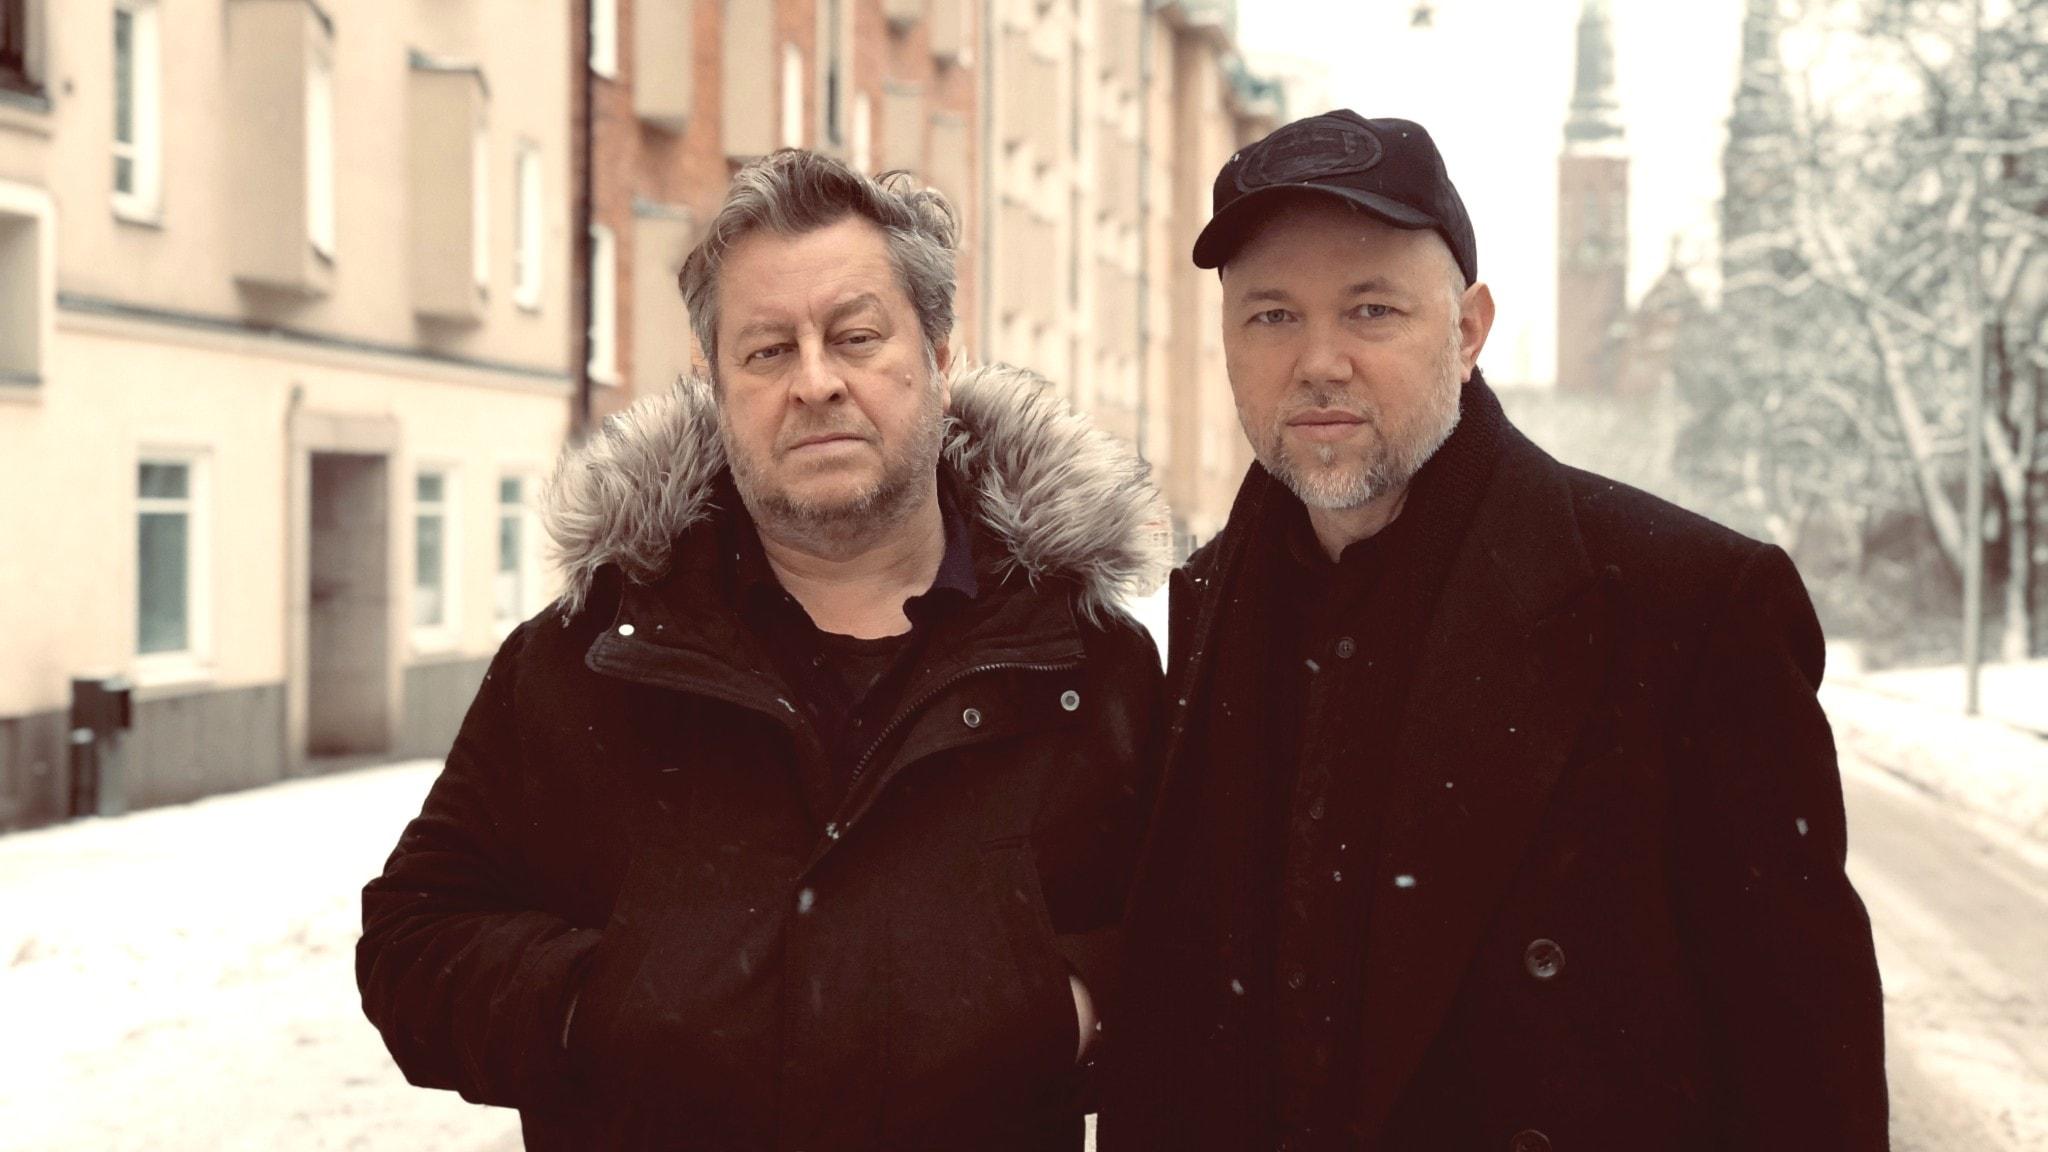 Mauro Scocco och Tomas Andersson Wij